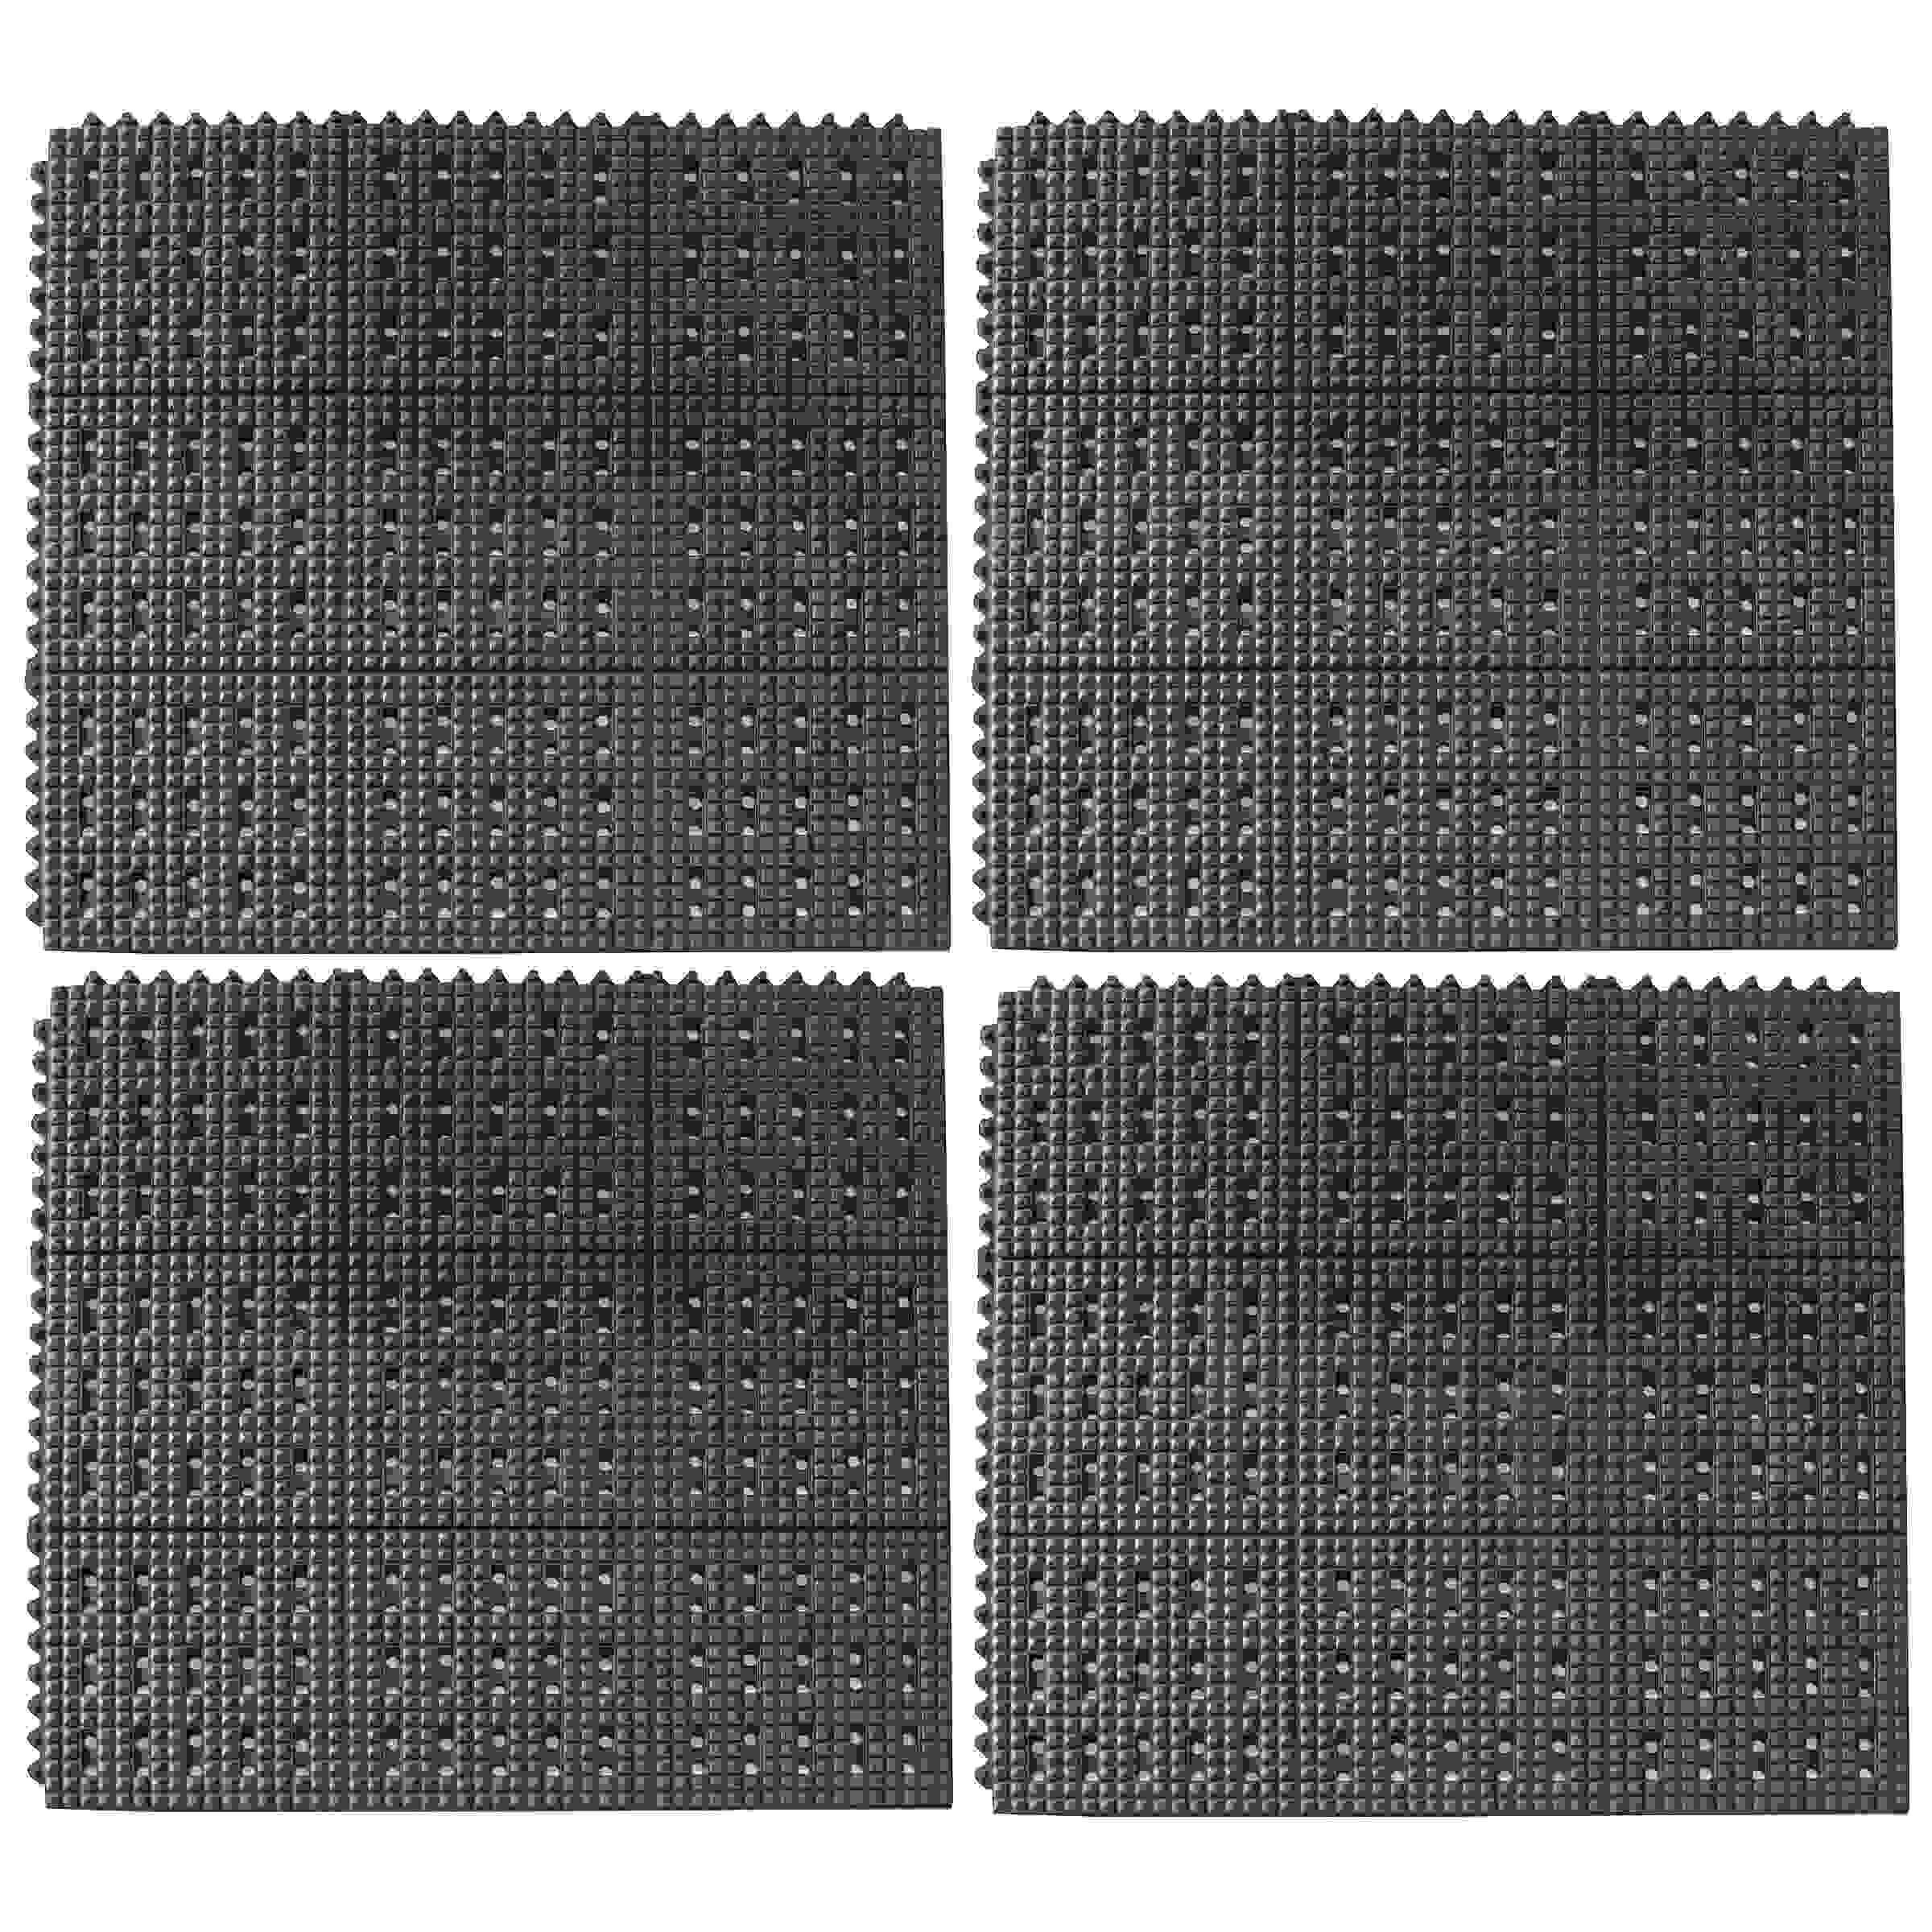 3 x 3 Foot Anti-Fatigue Interlocking Rubber Mats - 4 Pack